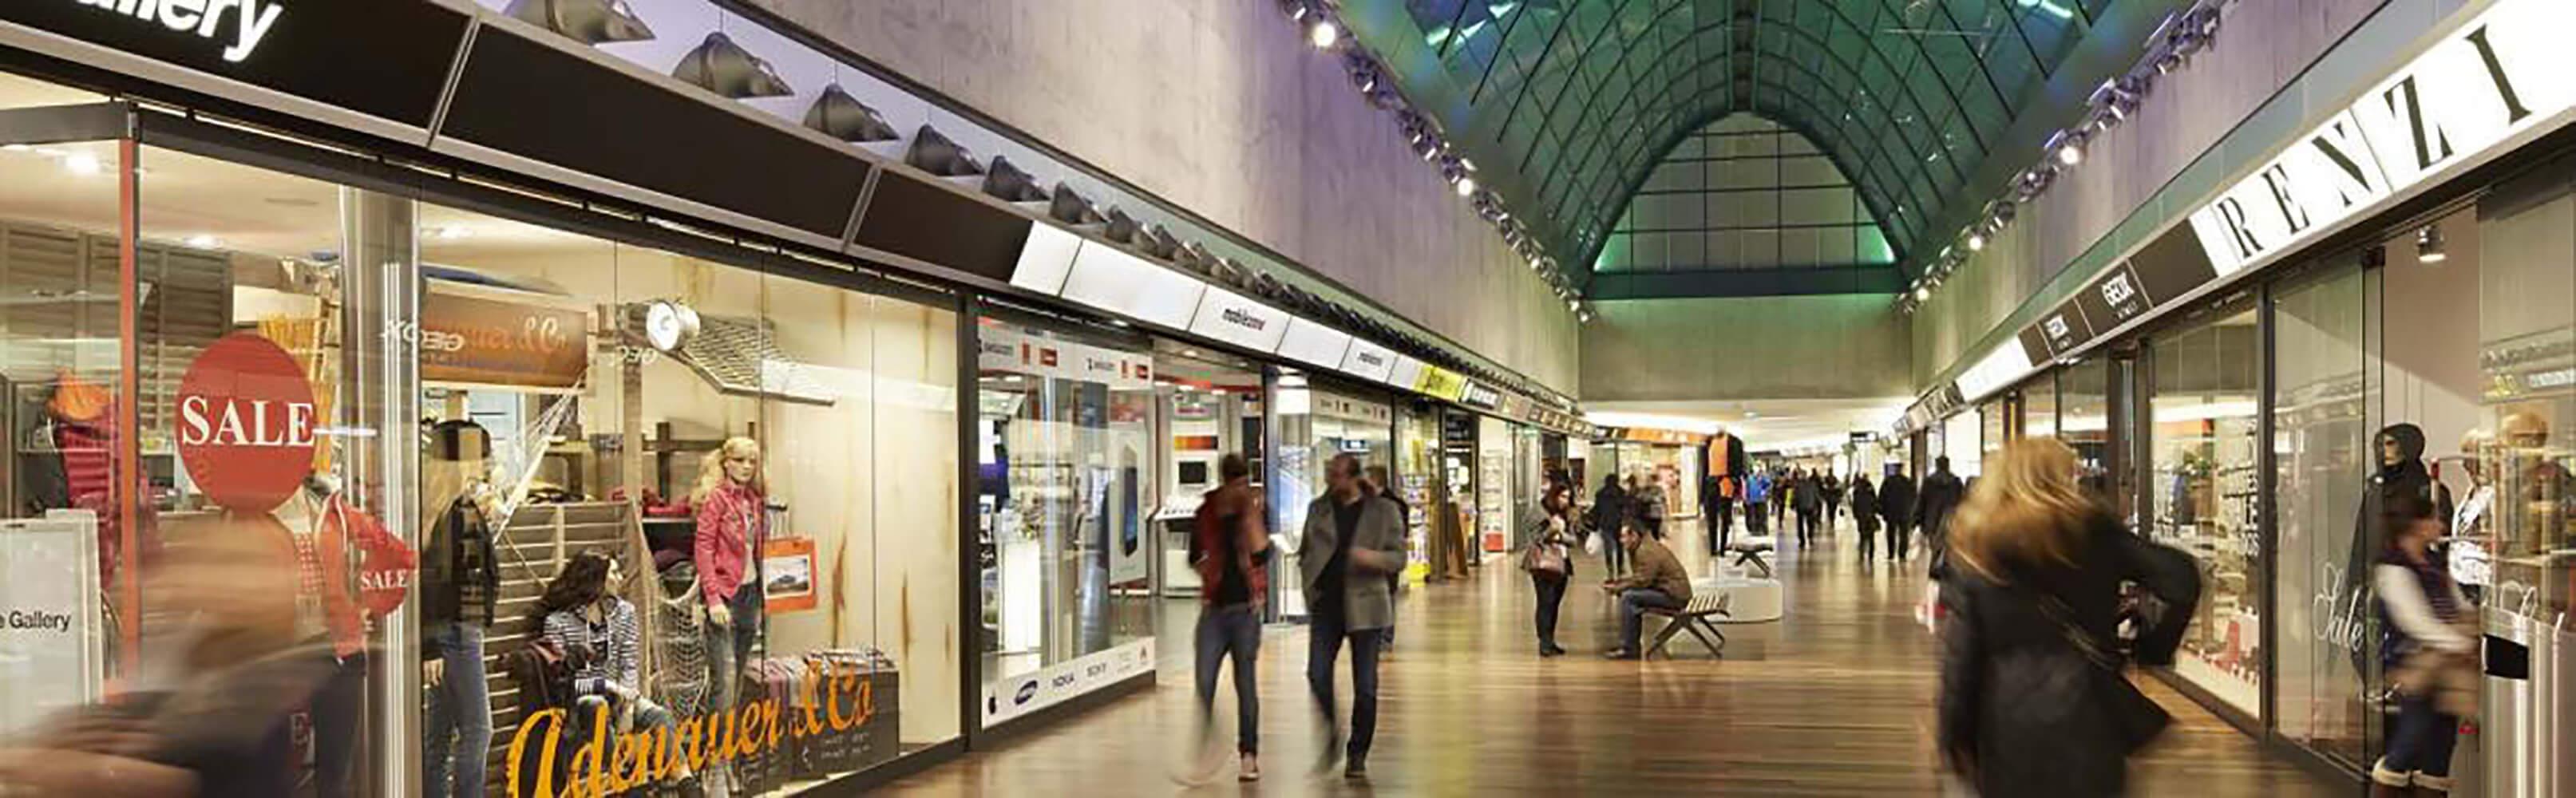 Shoppi Tivoli Spreitenbach  1